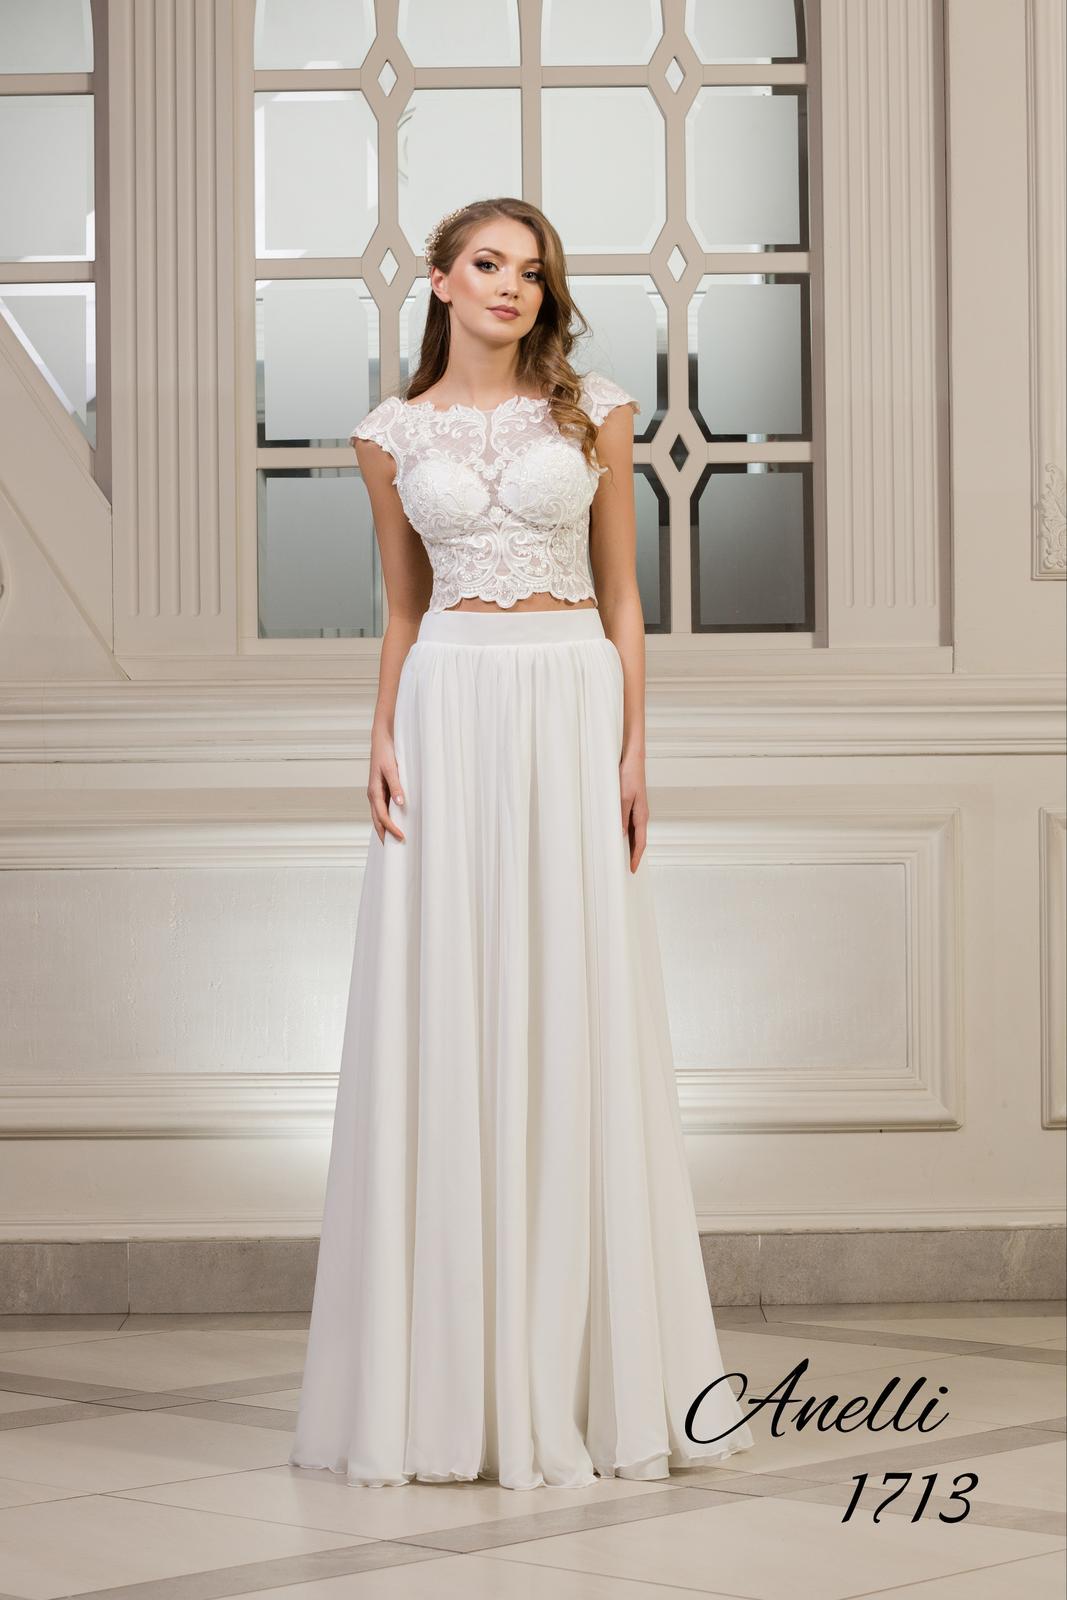 Svadobné šaty - Debut 1713 - Obrázok č. 2